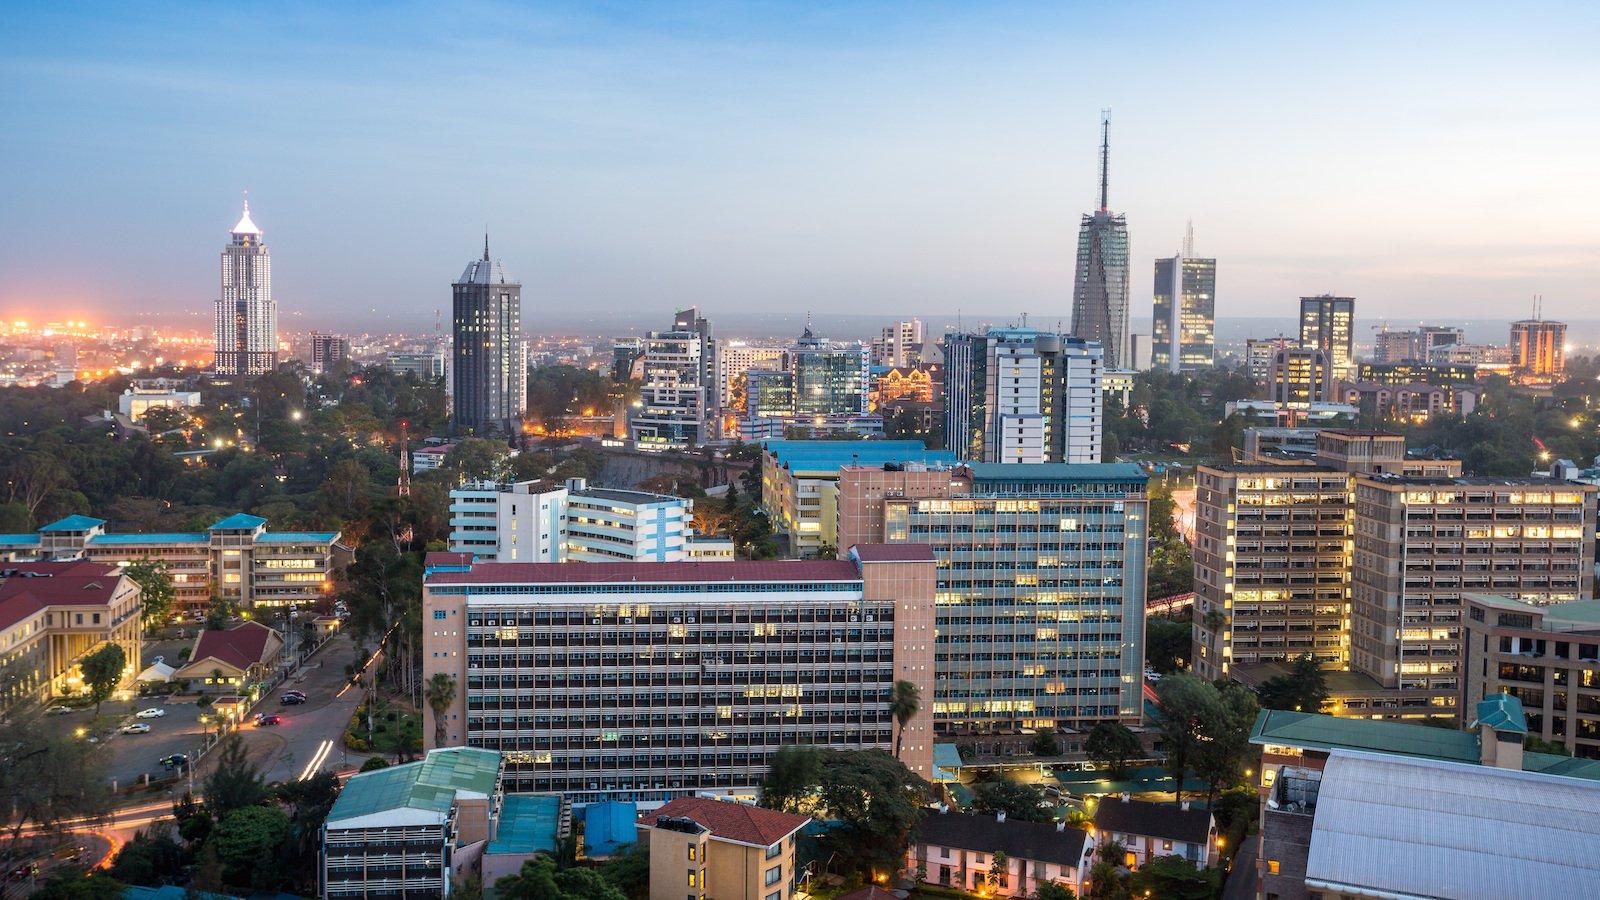 Clean Cooking Forum 2019 // November 5-7 // Nairobi, Kenya